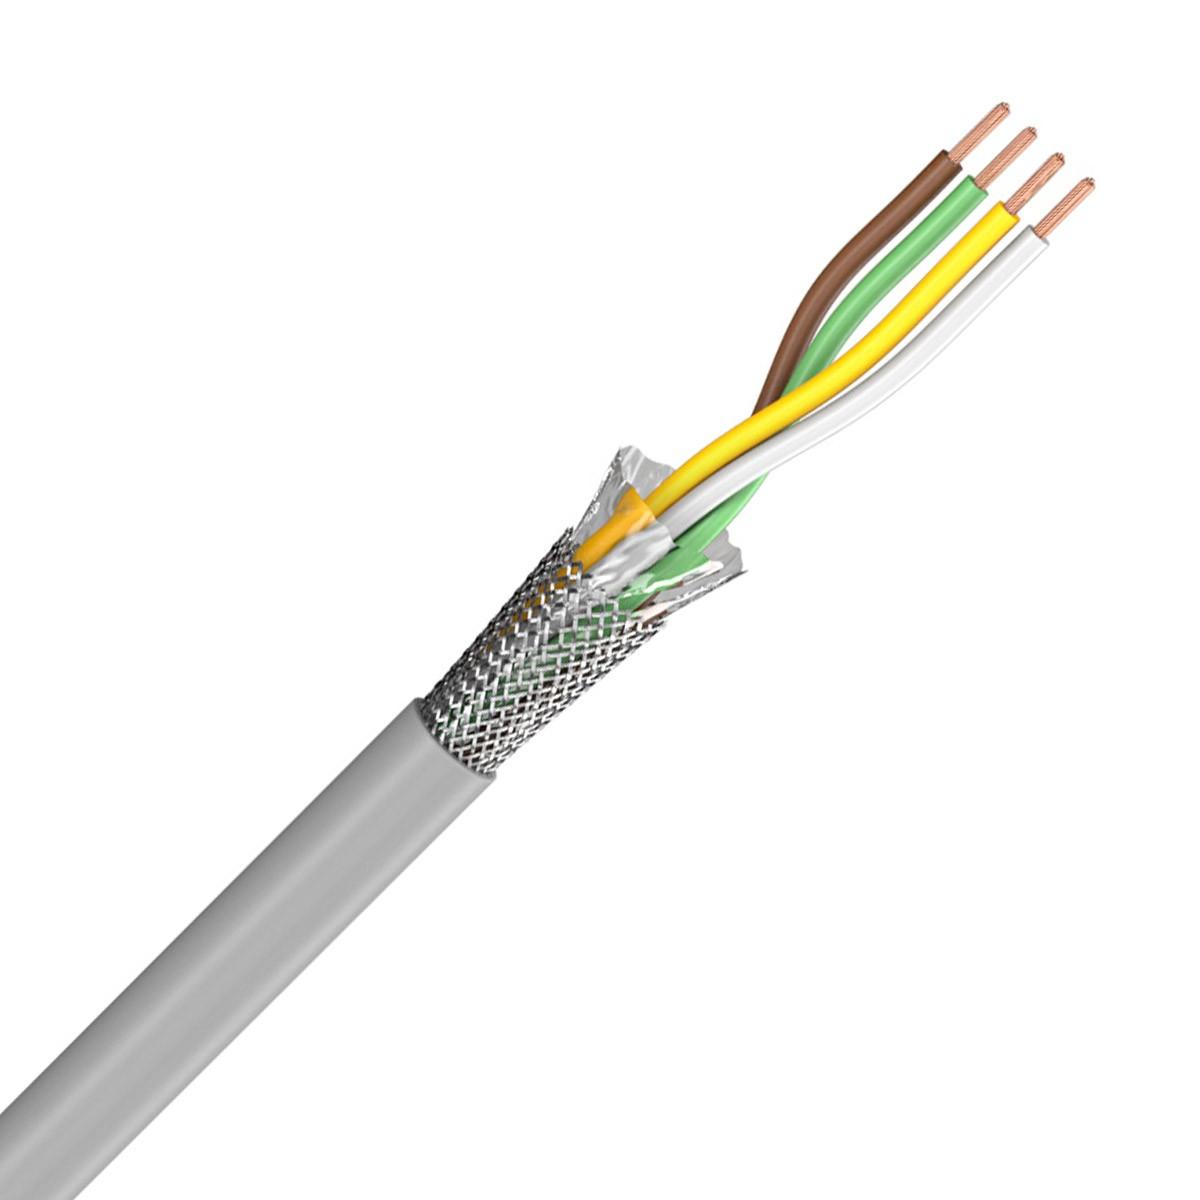 SOMMERCABLE CONTROL FLEX Câble de transfert I2S 4x0.25mm² Ø4.7mm